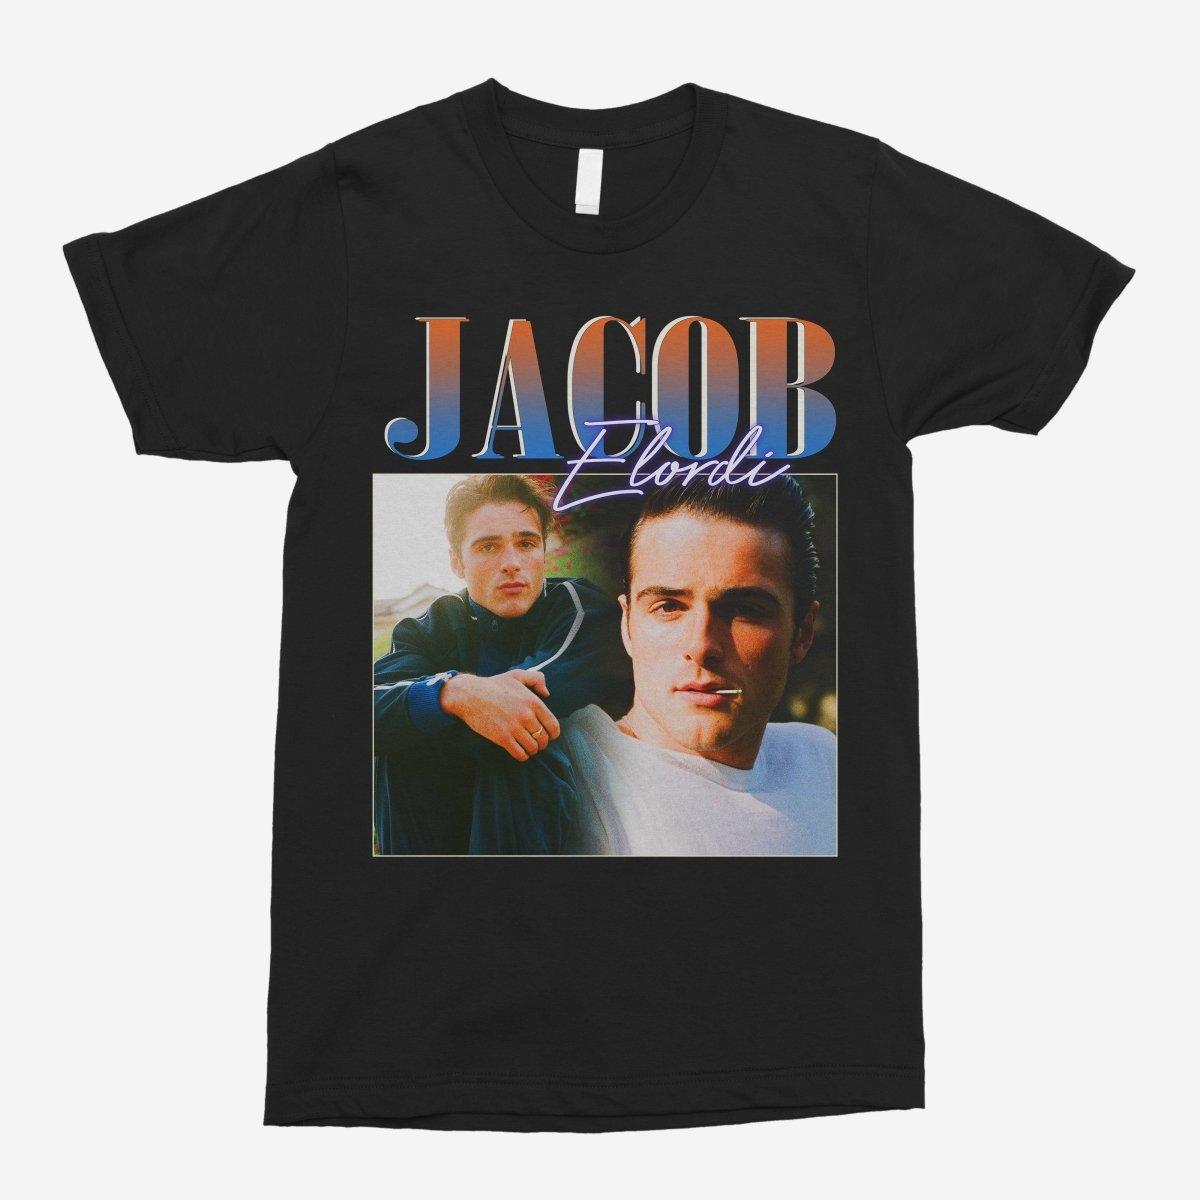 Jacob Elordi Vintage Unisex T-Shirt